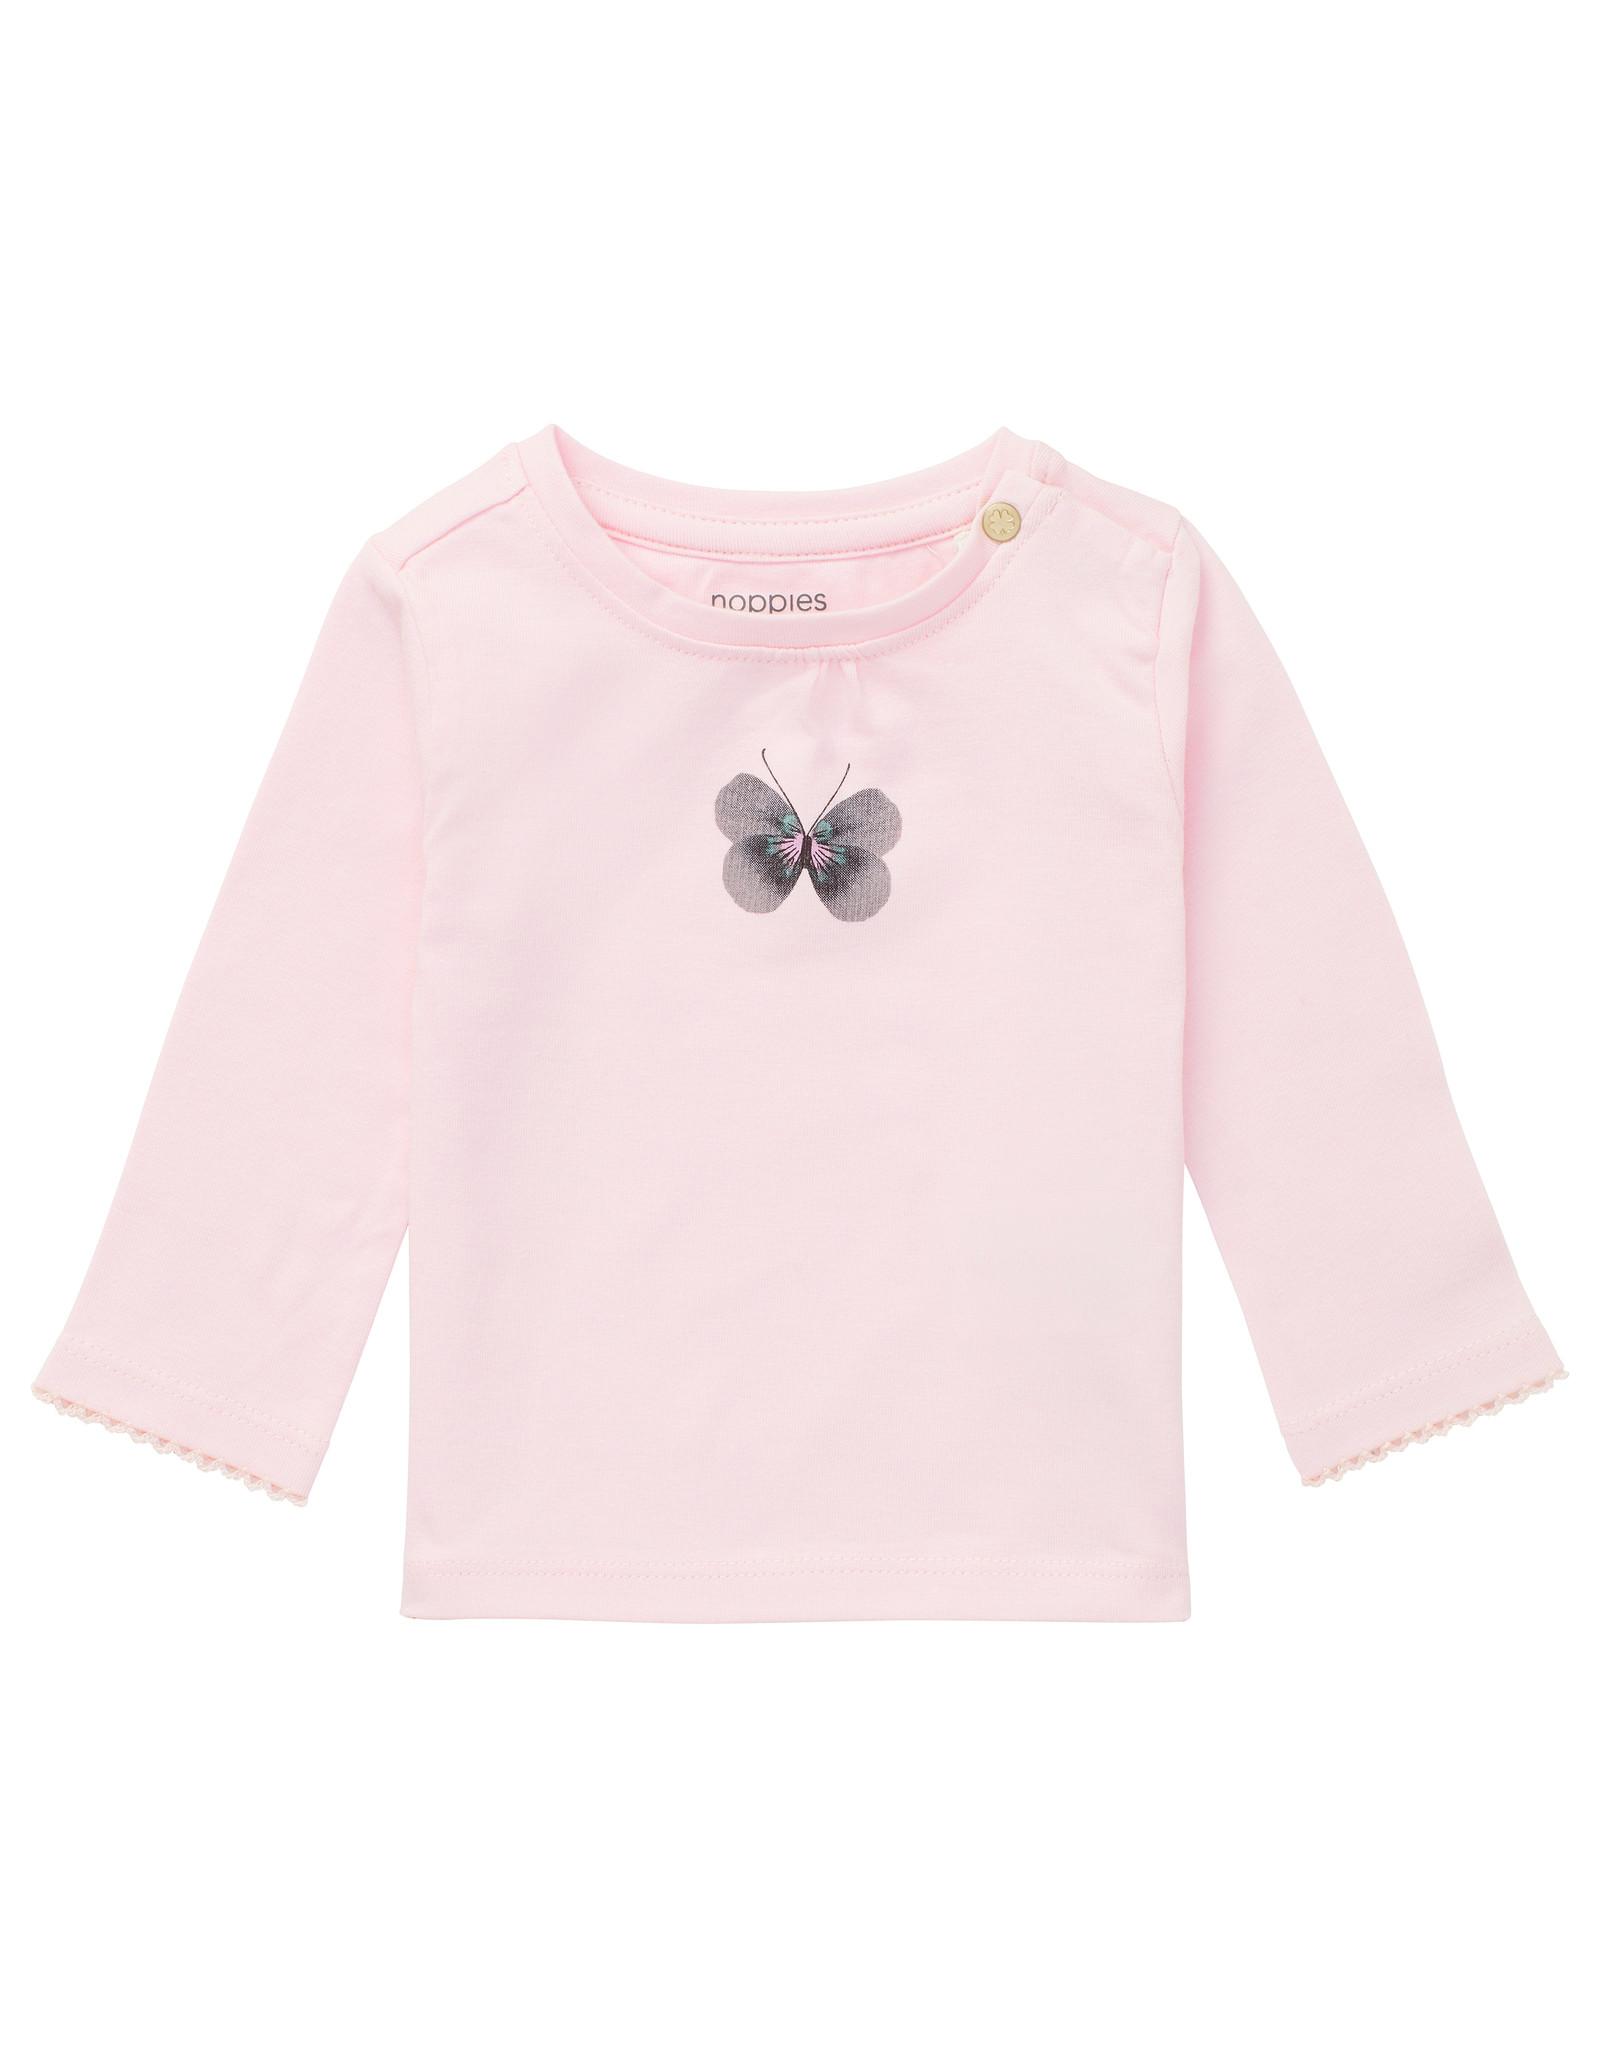 Noppies G T-shirt LS Moosomin, Primrose Pink